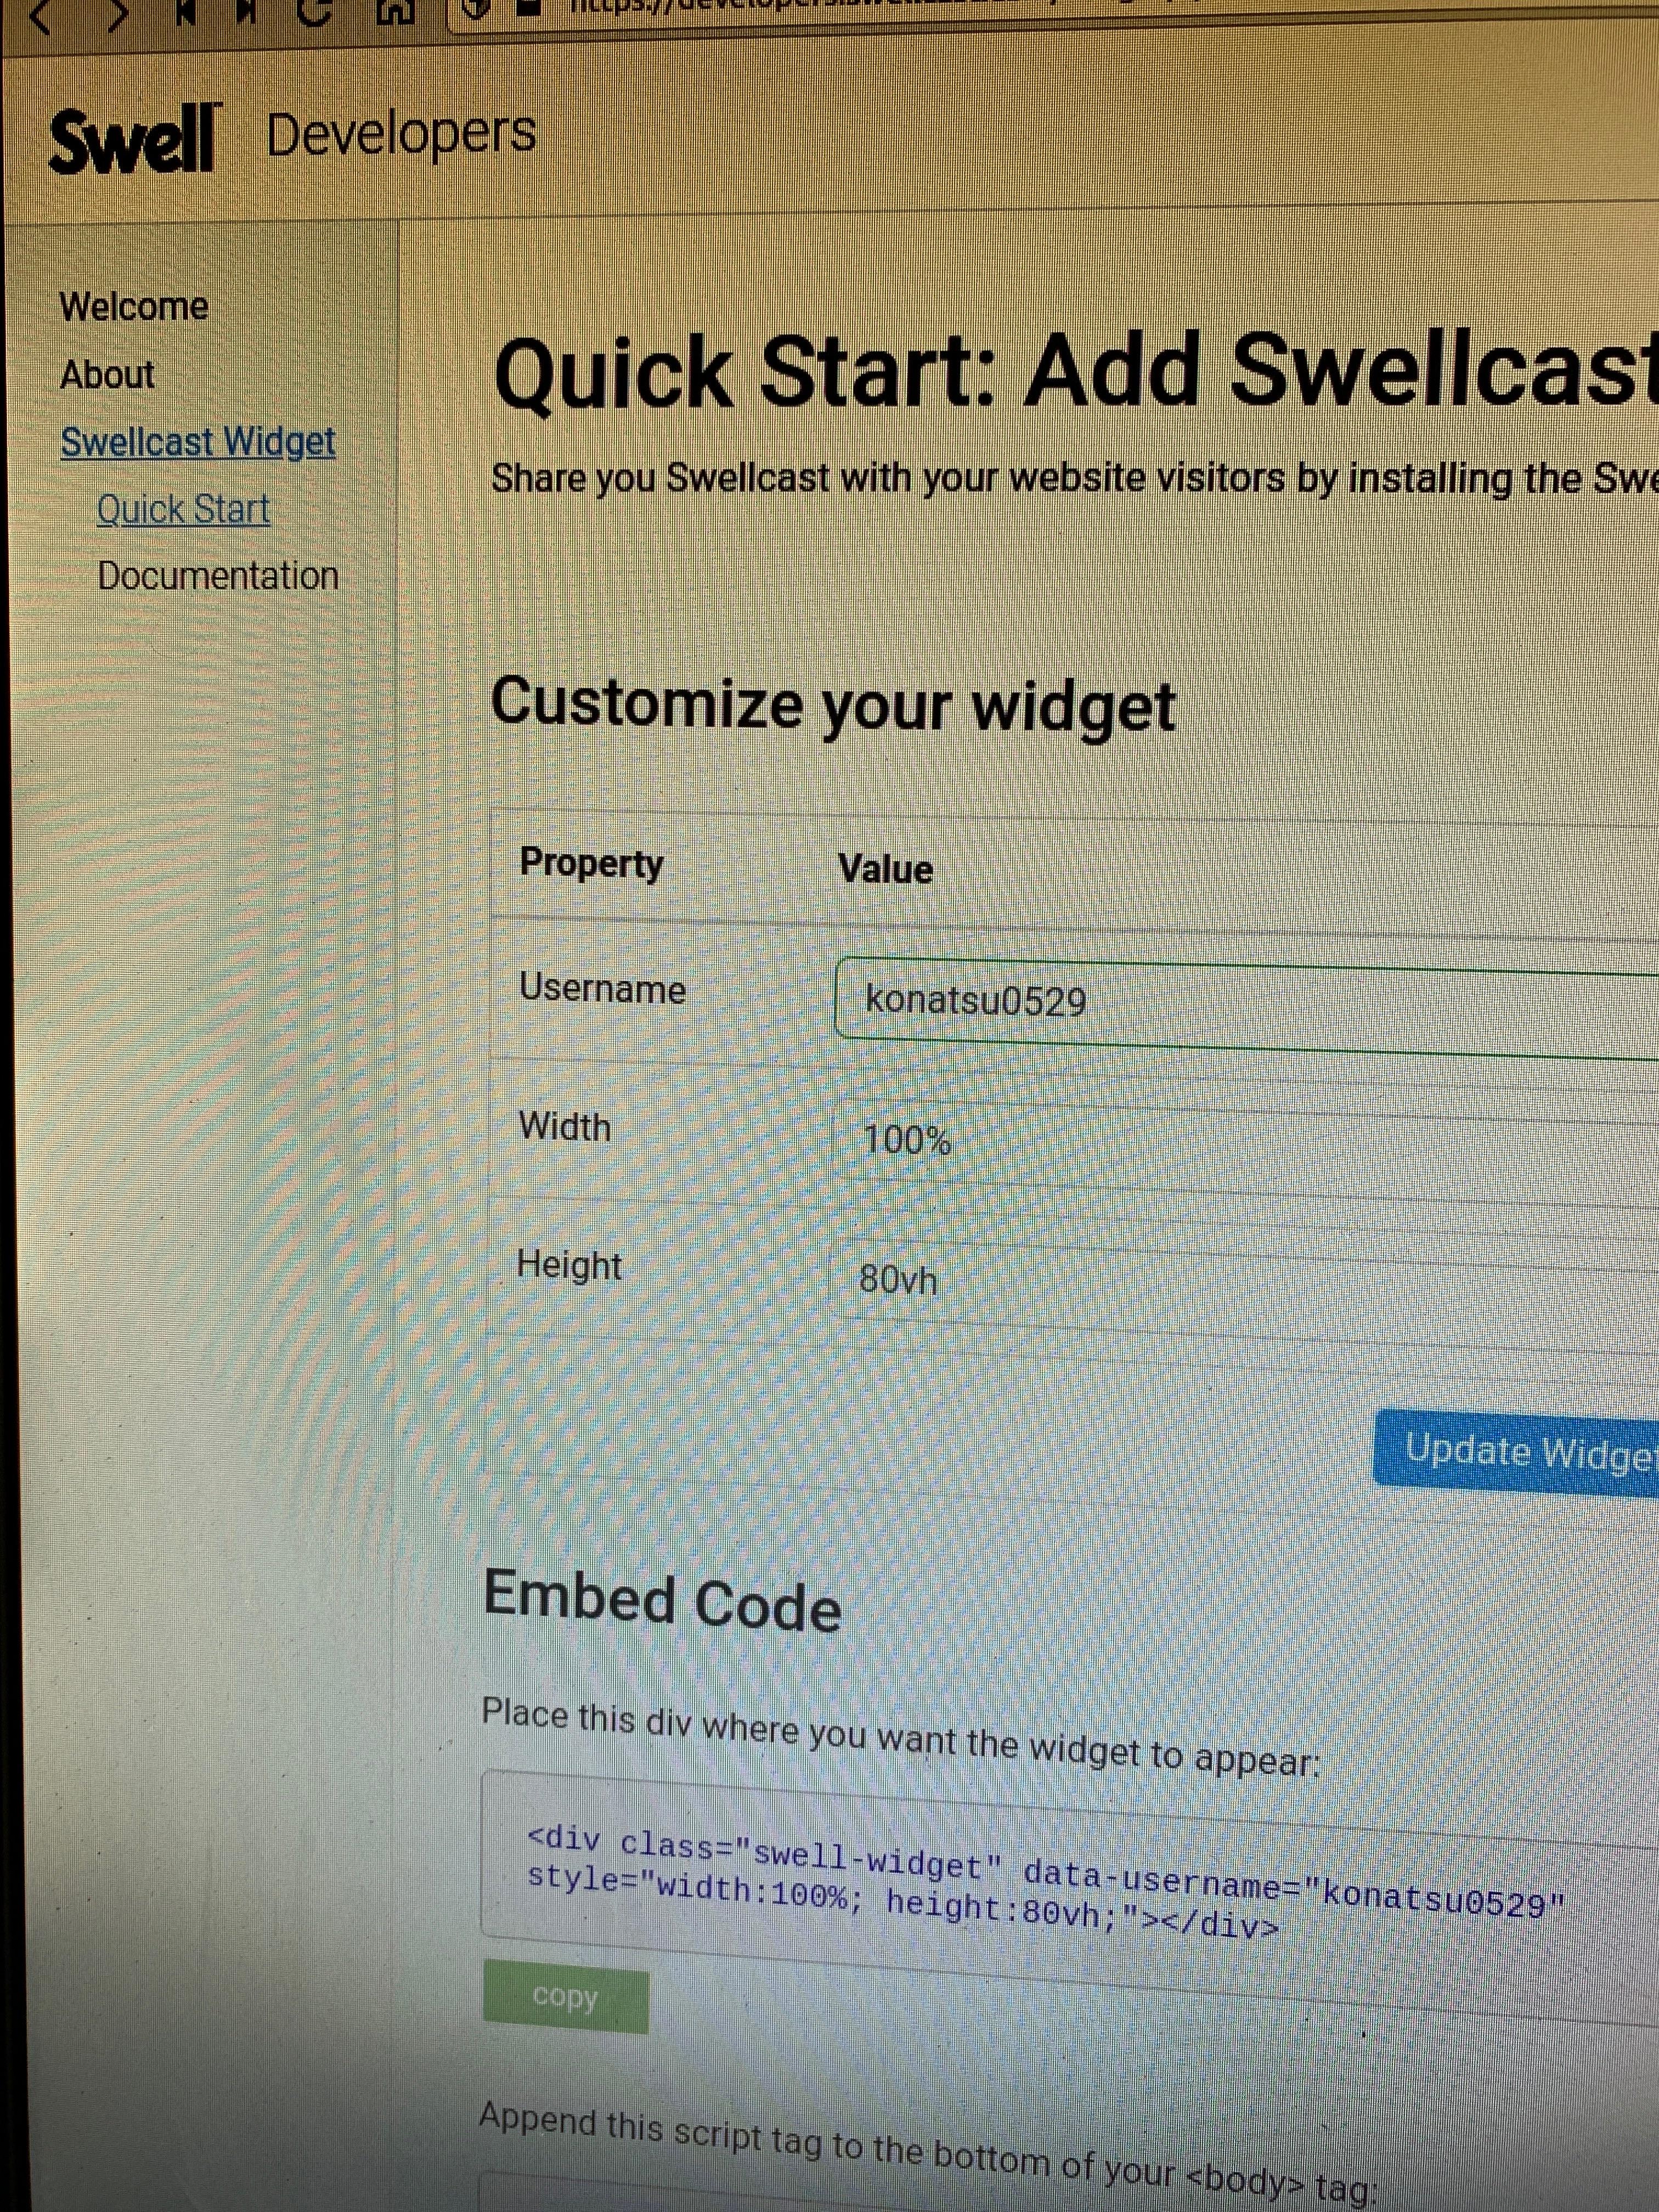 Swell Developers - Swellcast Widget